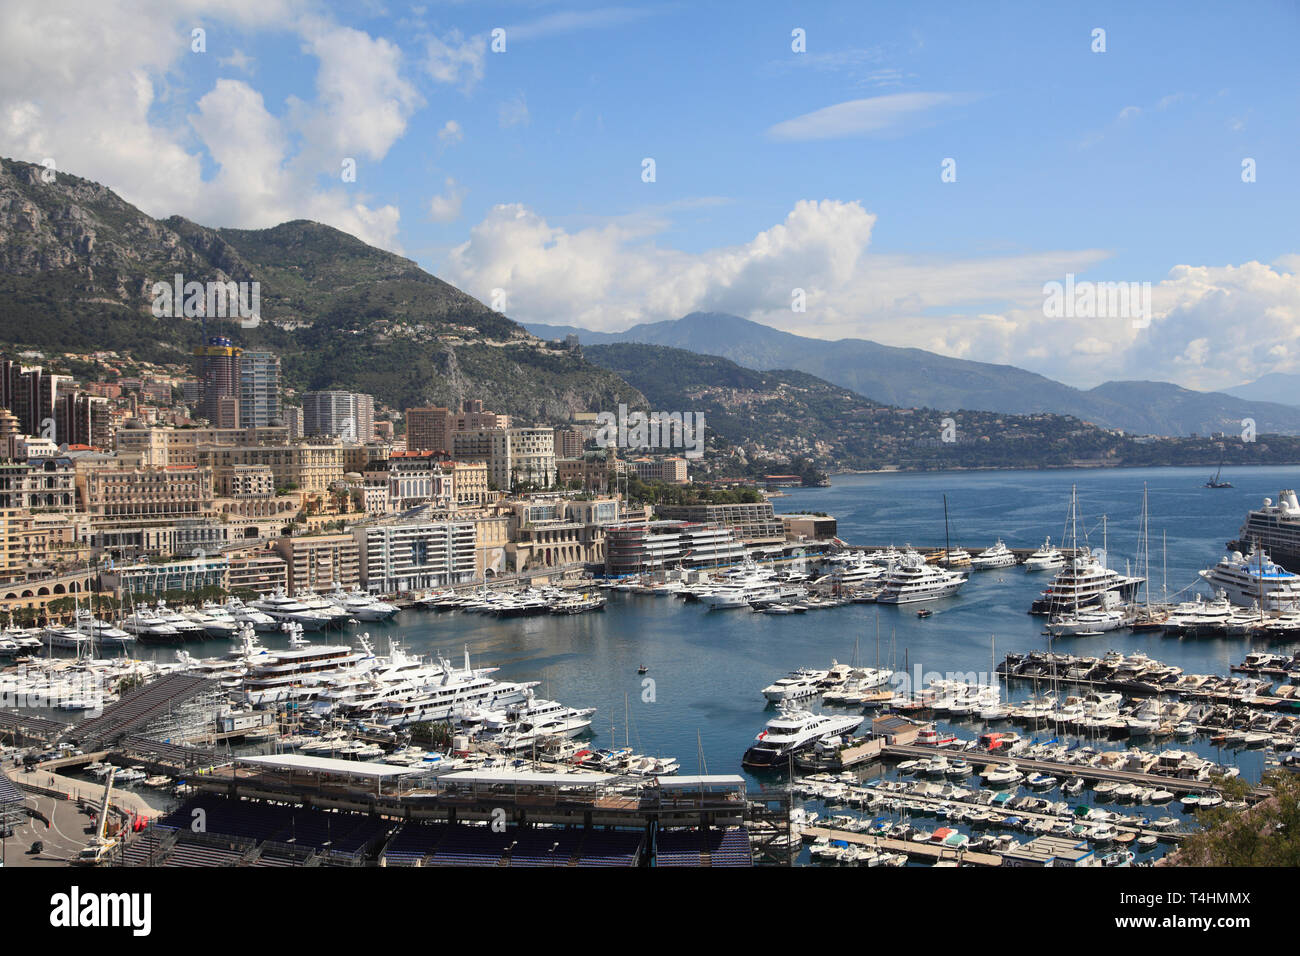 Port Hercule, Harbor, Monte Carlo, Monaco, Cote d Azur, Mediterranean, Europe - Stock Image